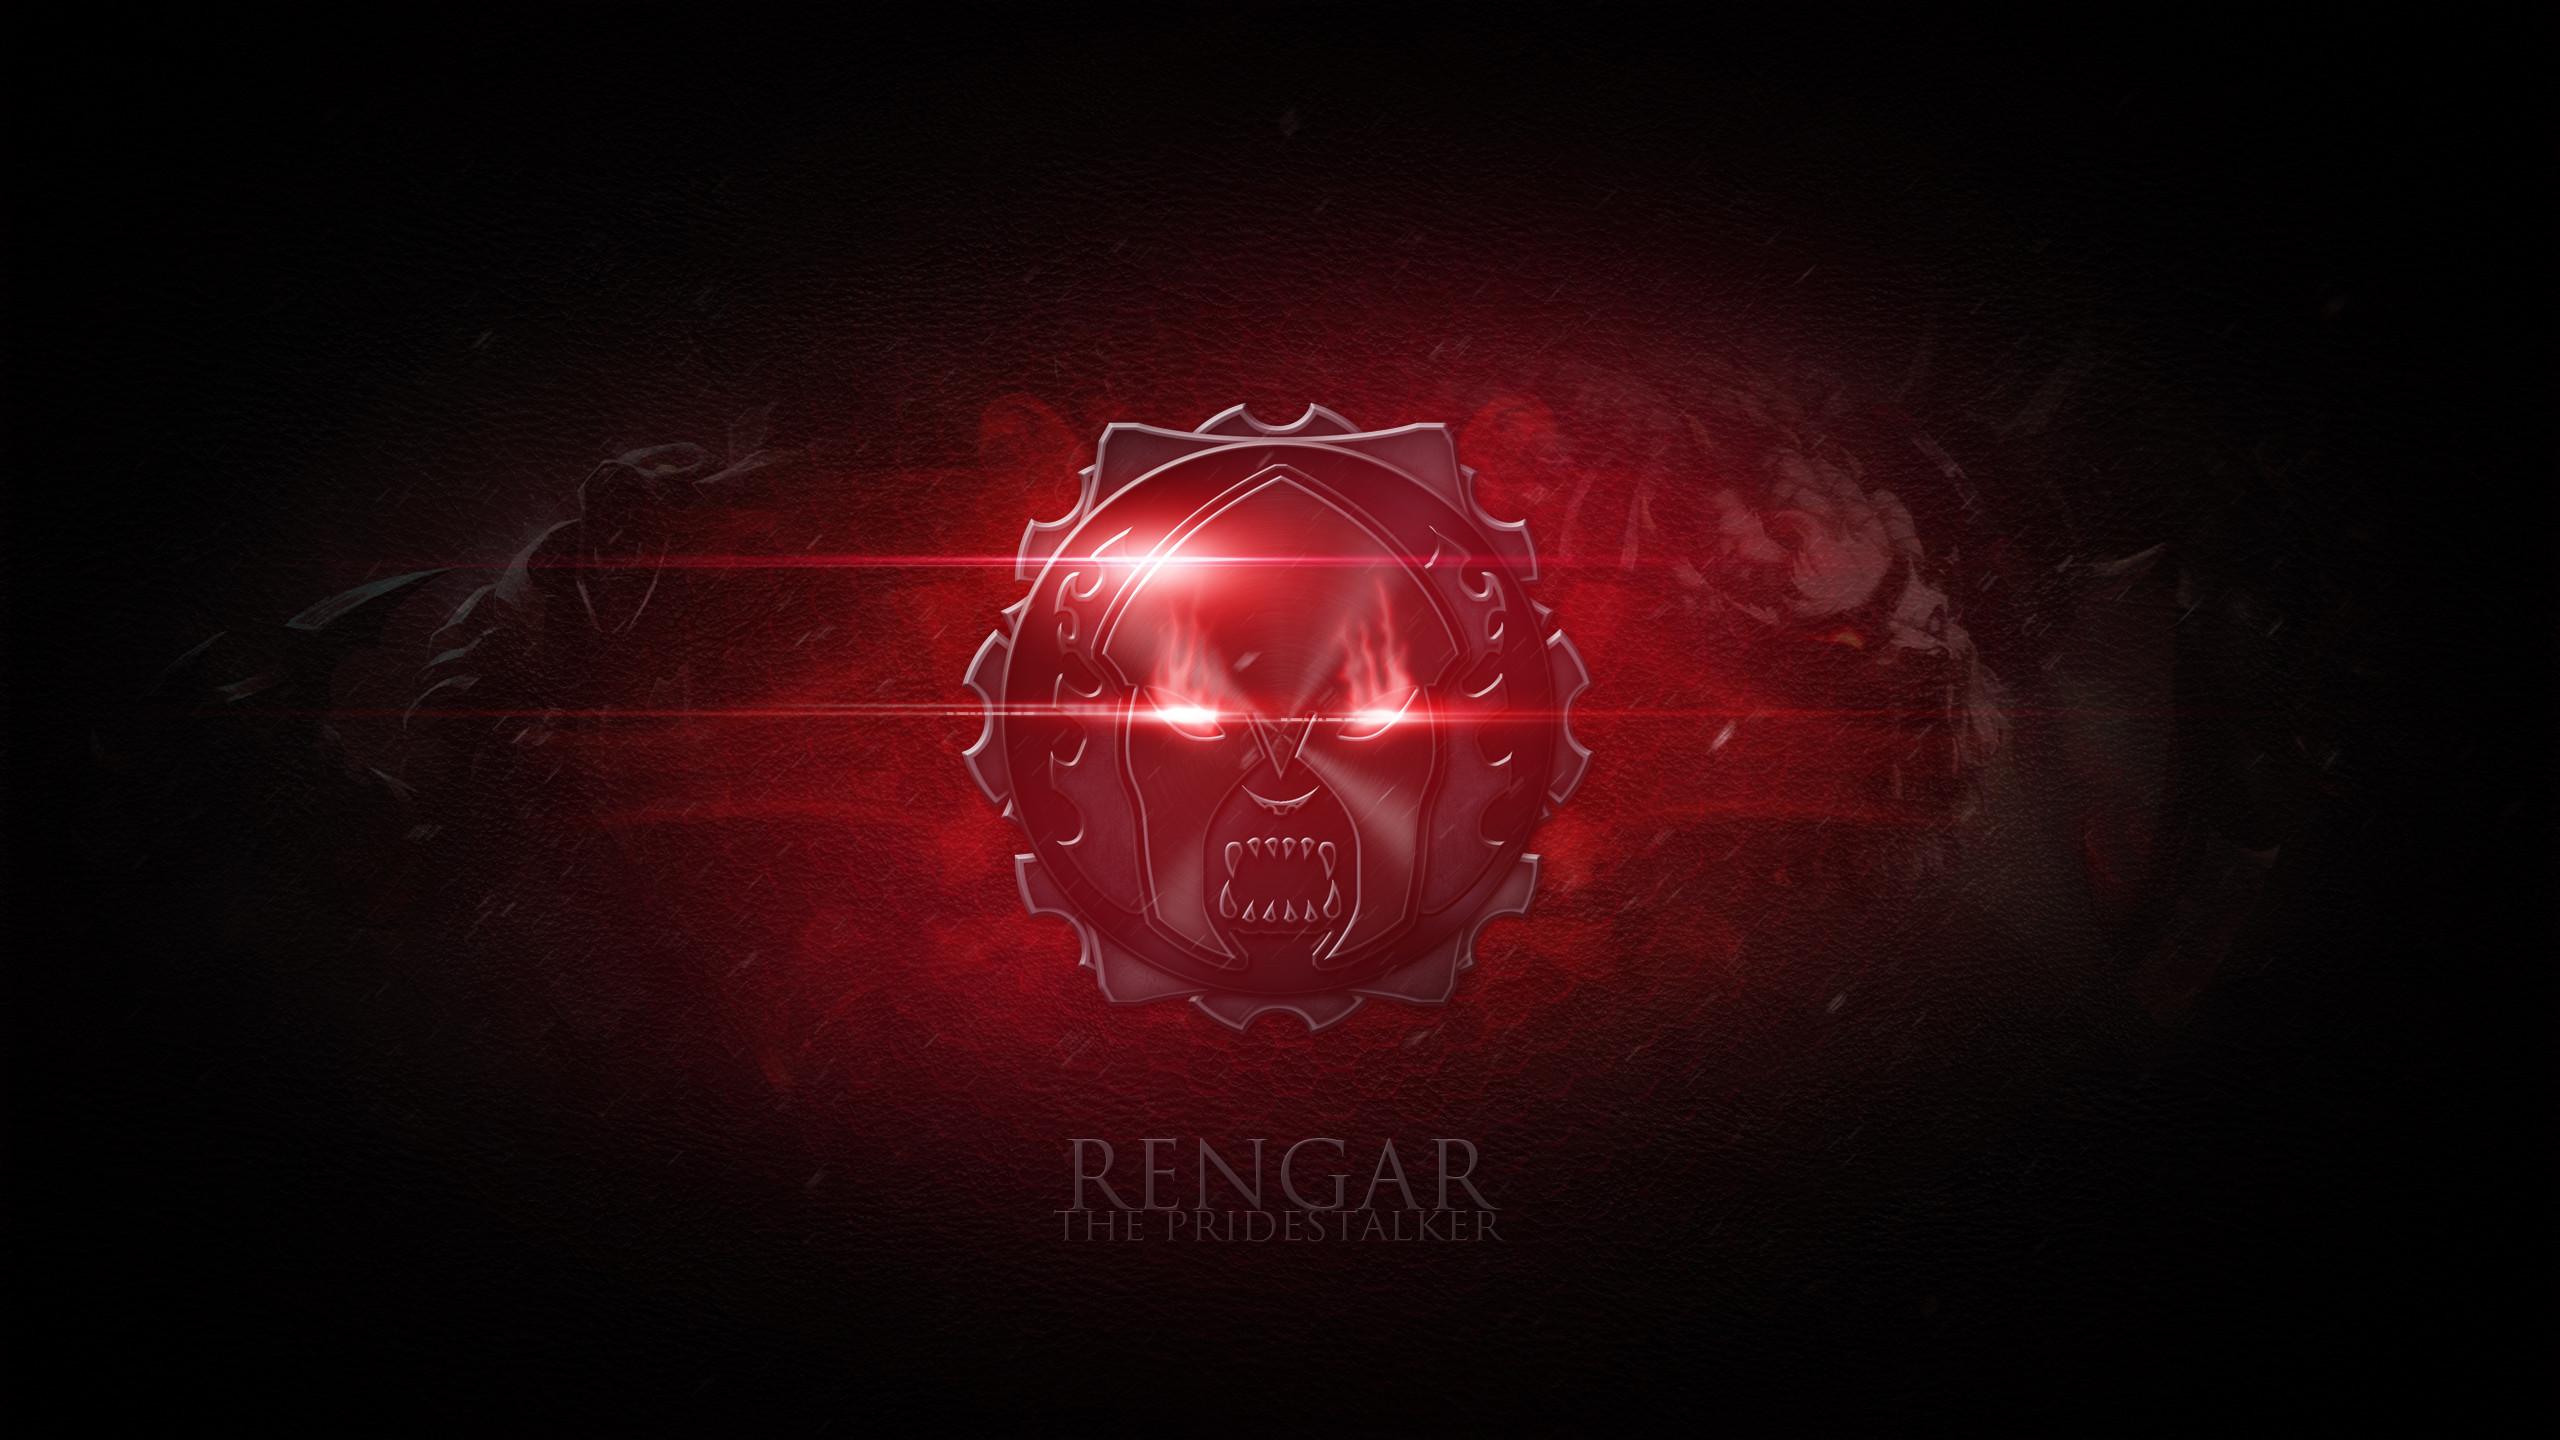 Rengar League Of Legends Wallpapers HD 1920×1080